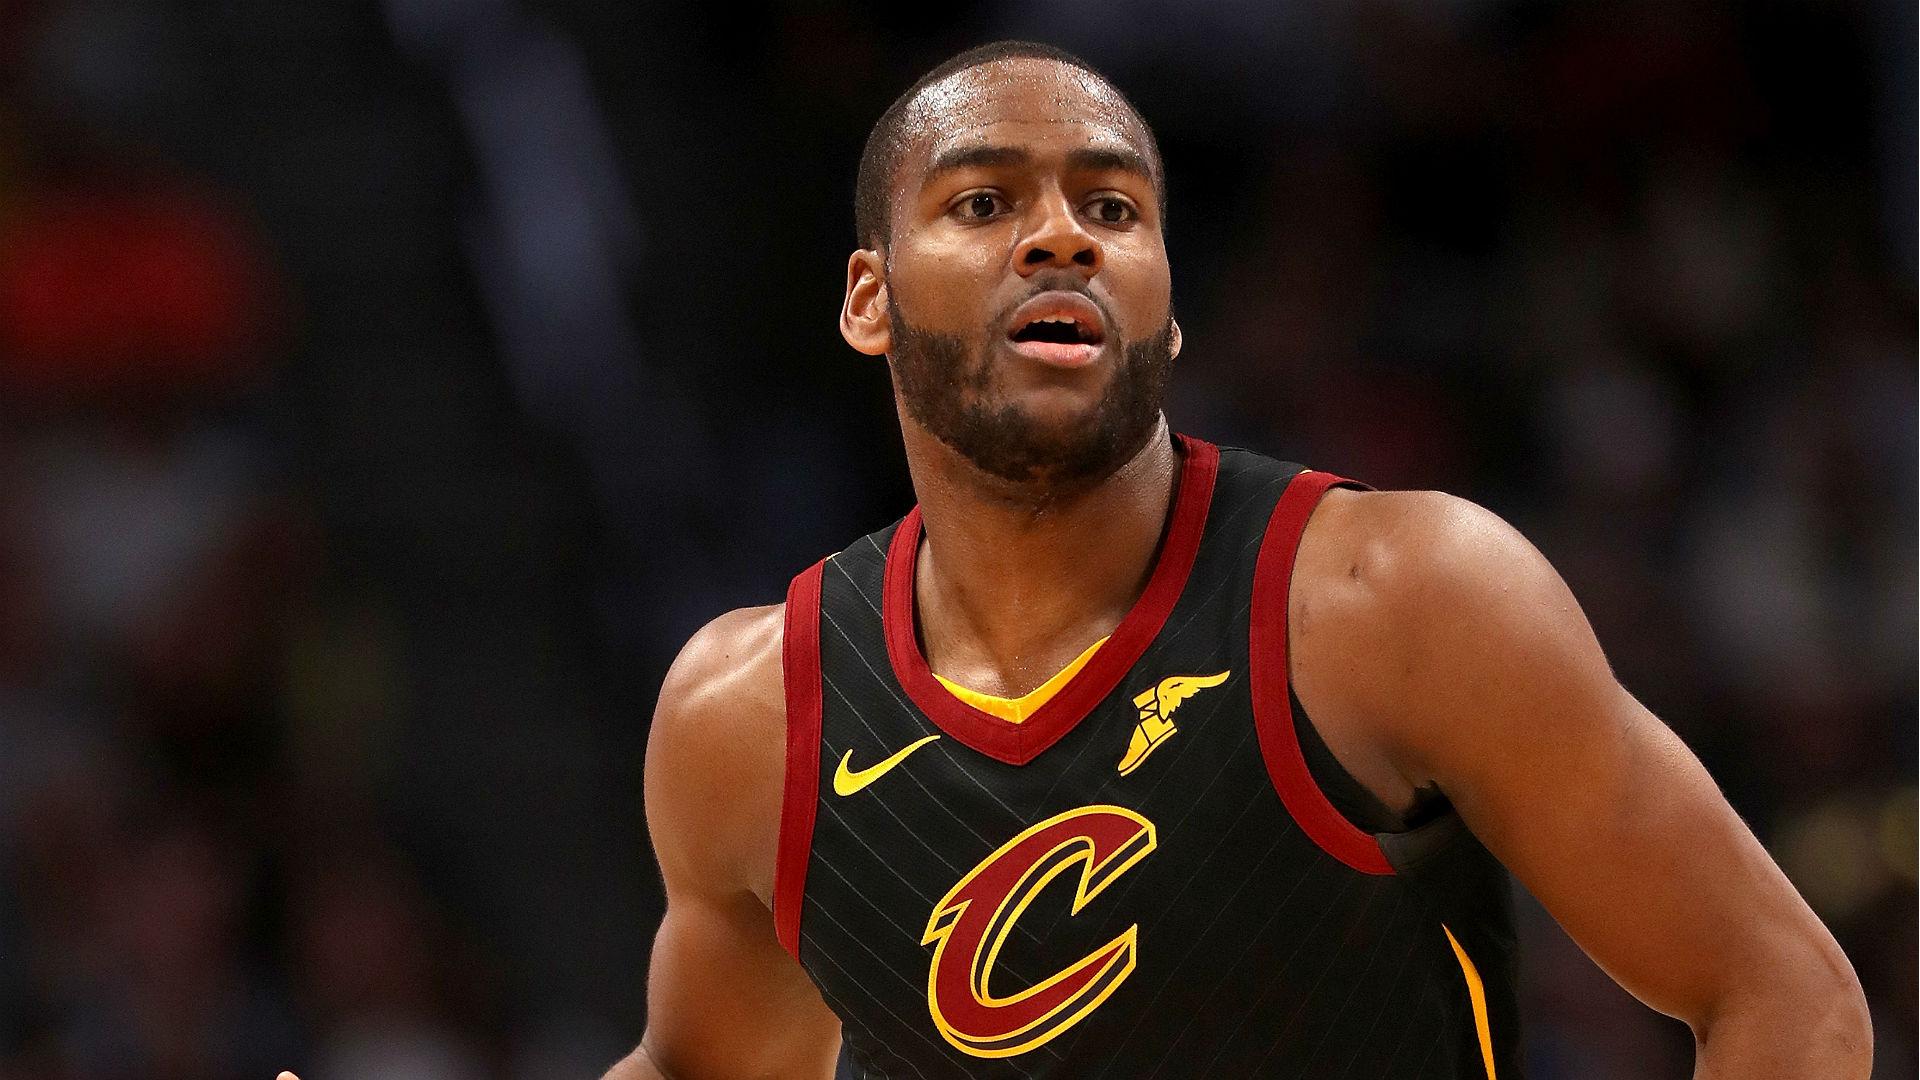 NBA trade rumors: Thunder, Rockets interested in Cavaliers